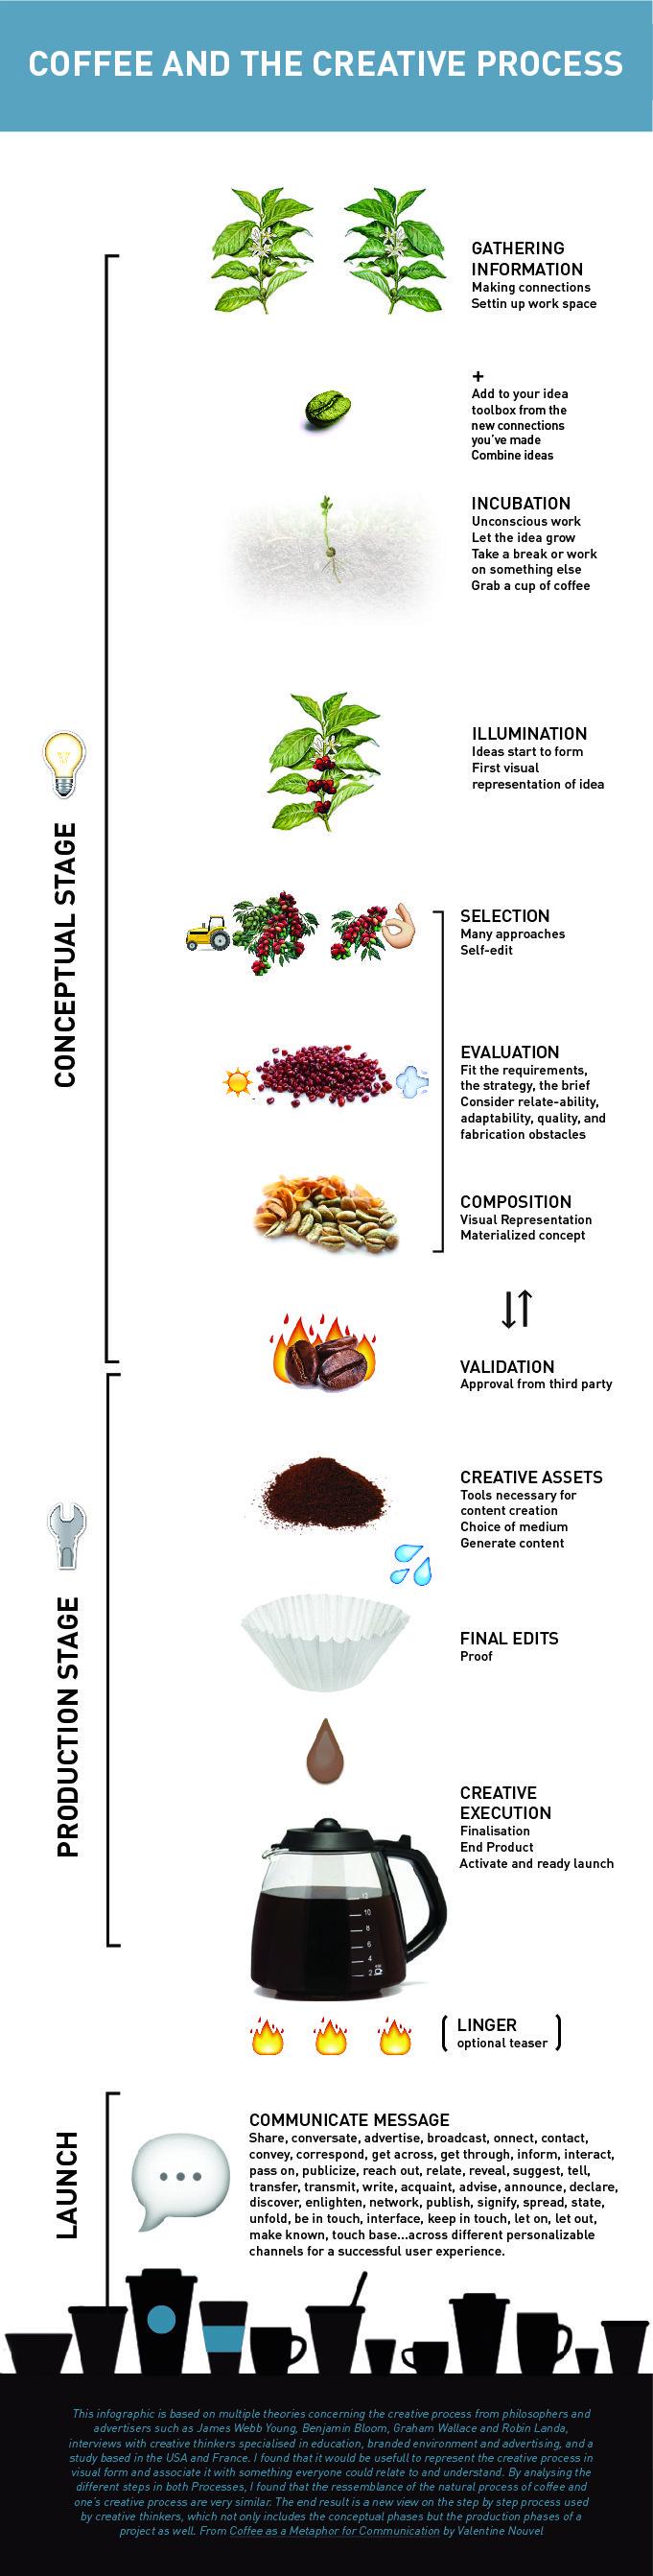 Infographic-Coffee-CreativeProcess